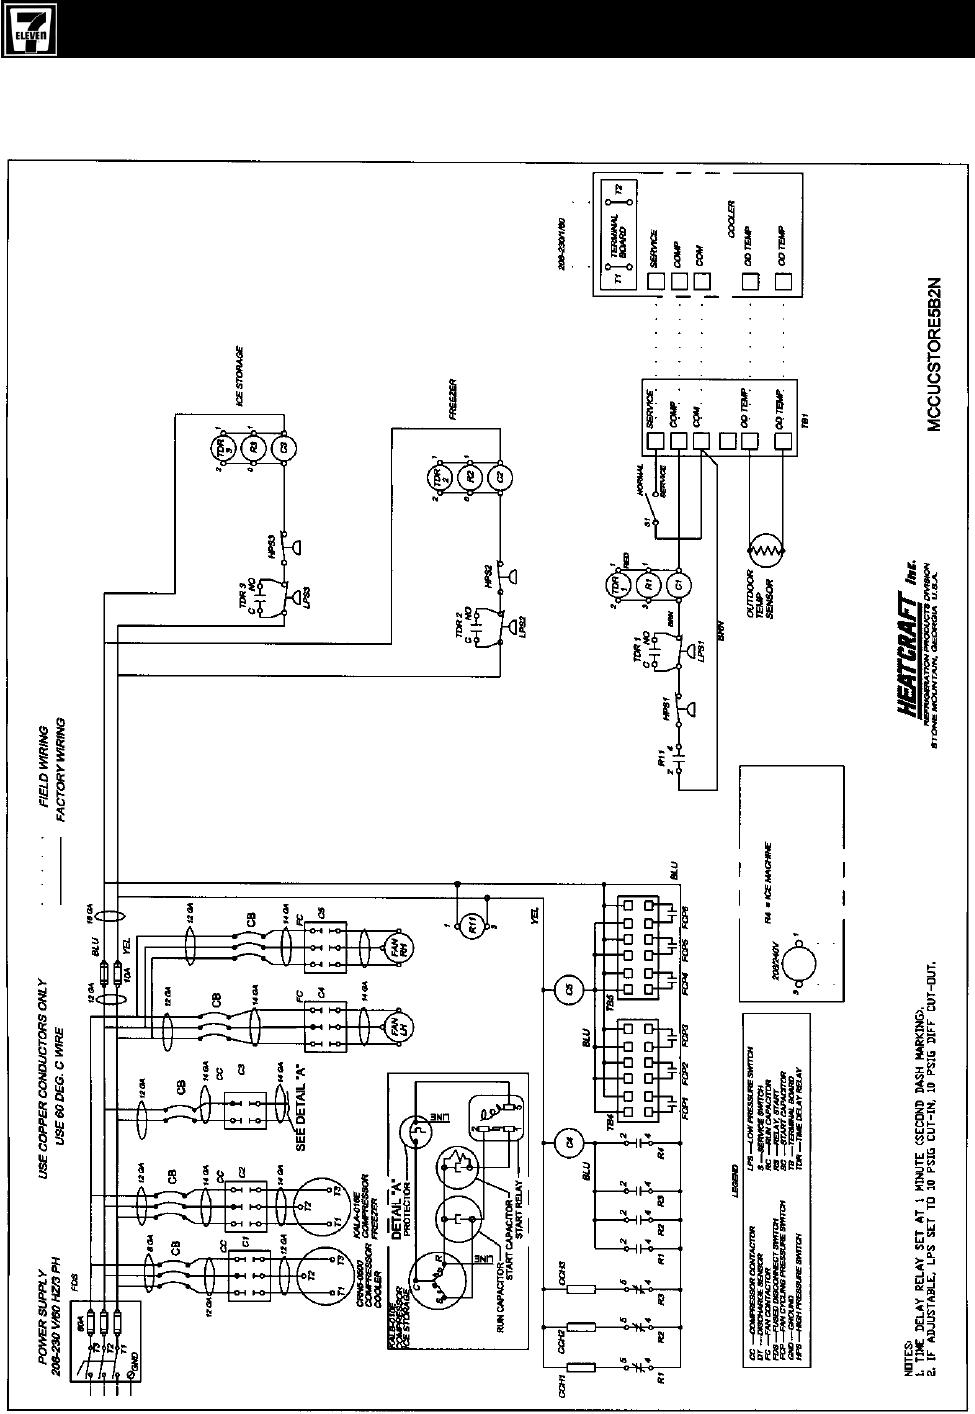 [DIAGRAM] Mahindra 3016 Wiring Diagram FULL Version HD